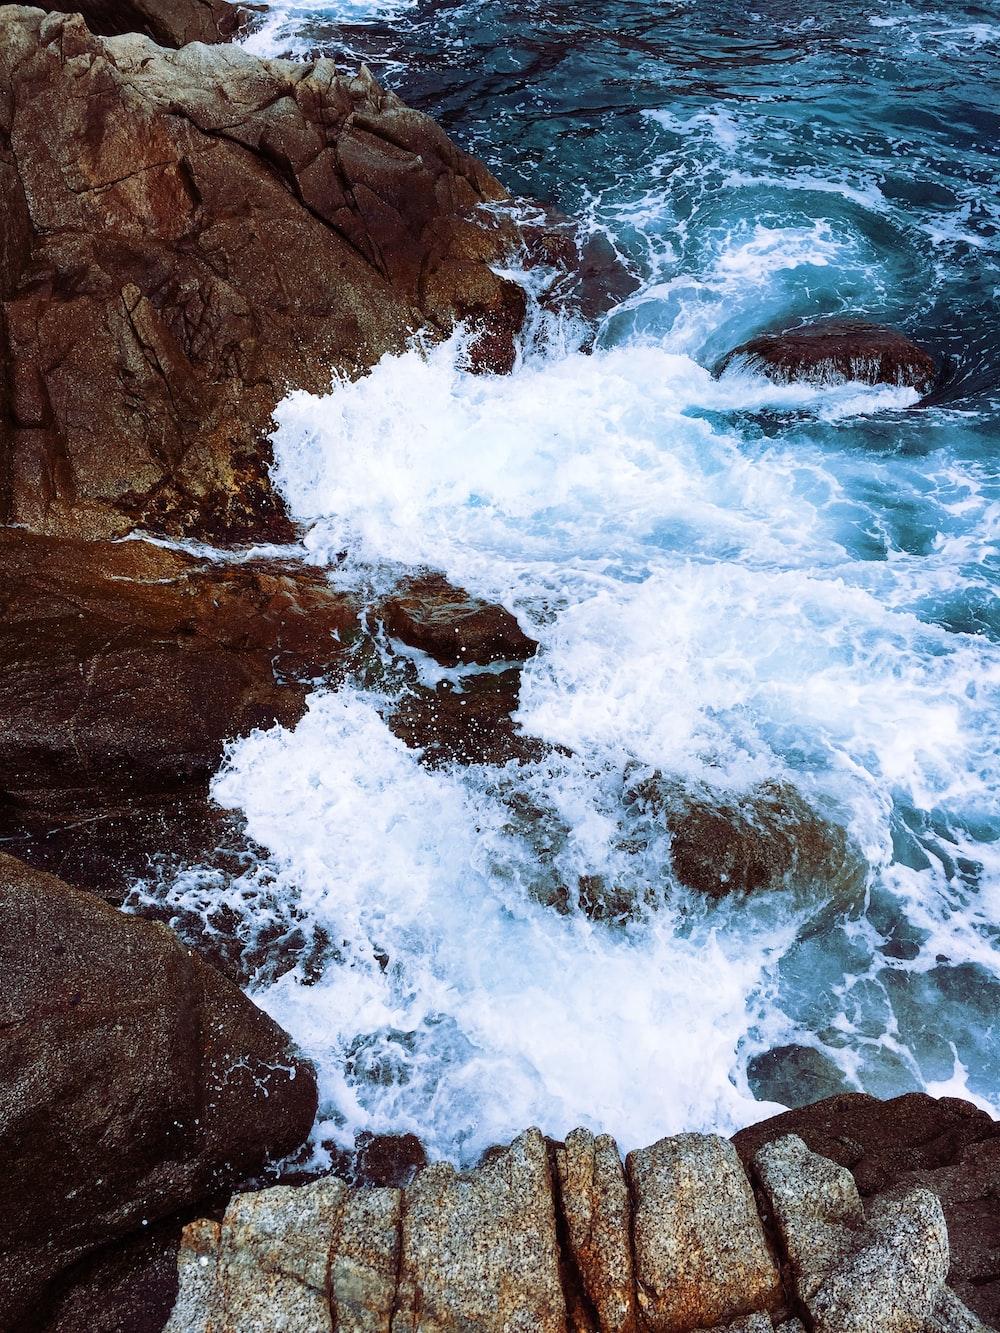 time lapse photography of waves splashing on rocks